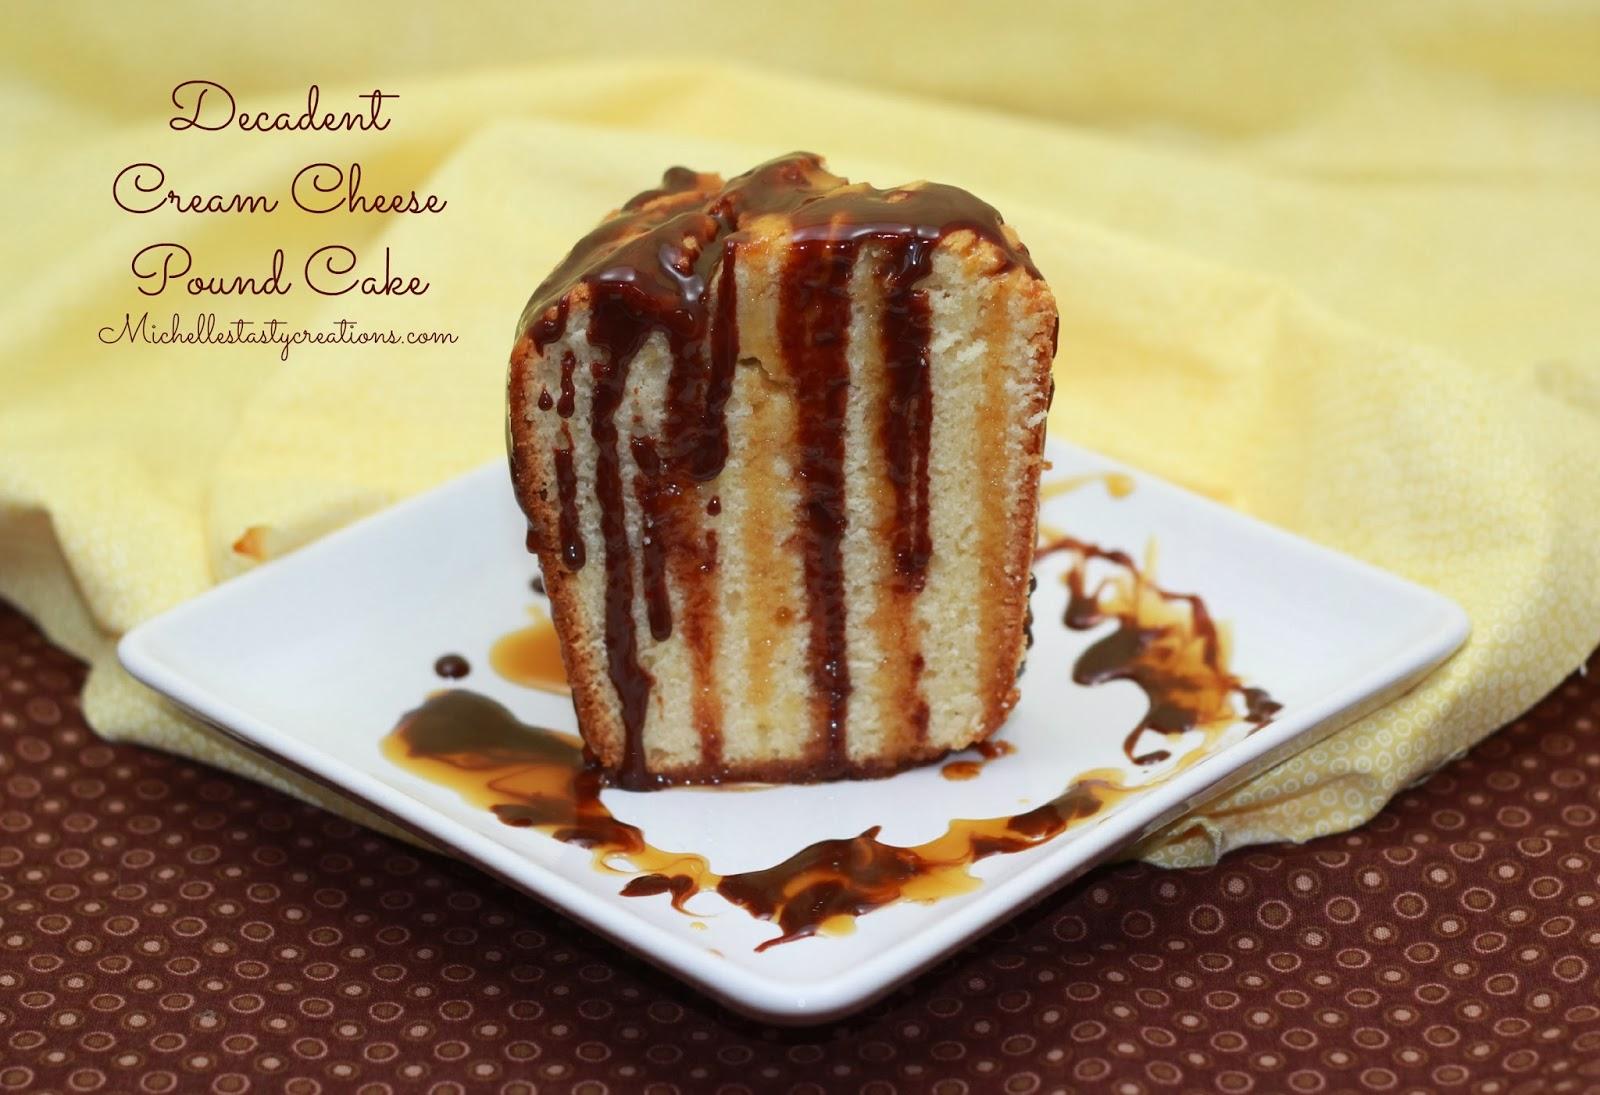 Cream Cheese Pound Cake Recipe Joy Of Baking: Michelle's Tasty Creations: Decadent Cream Cheese Pound Cake